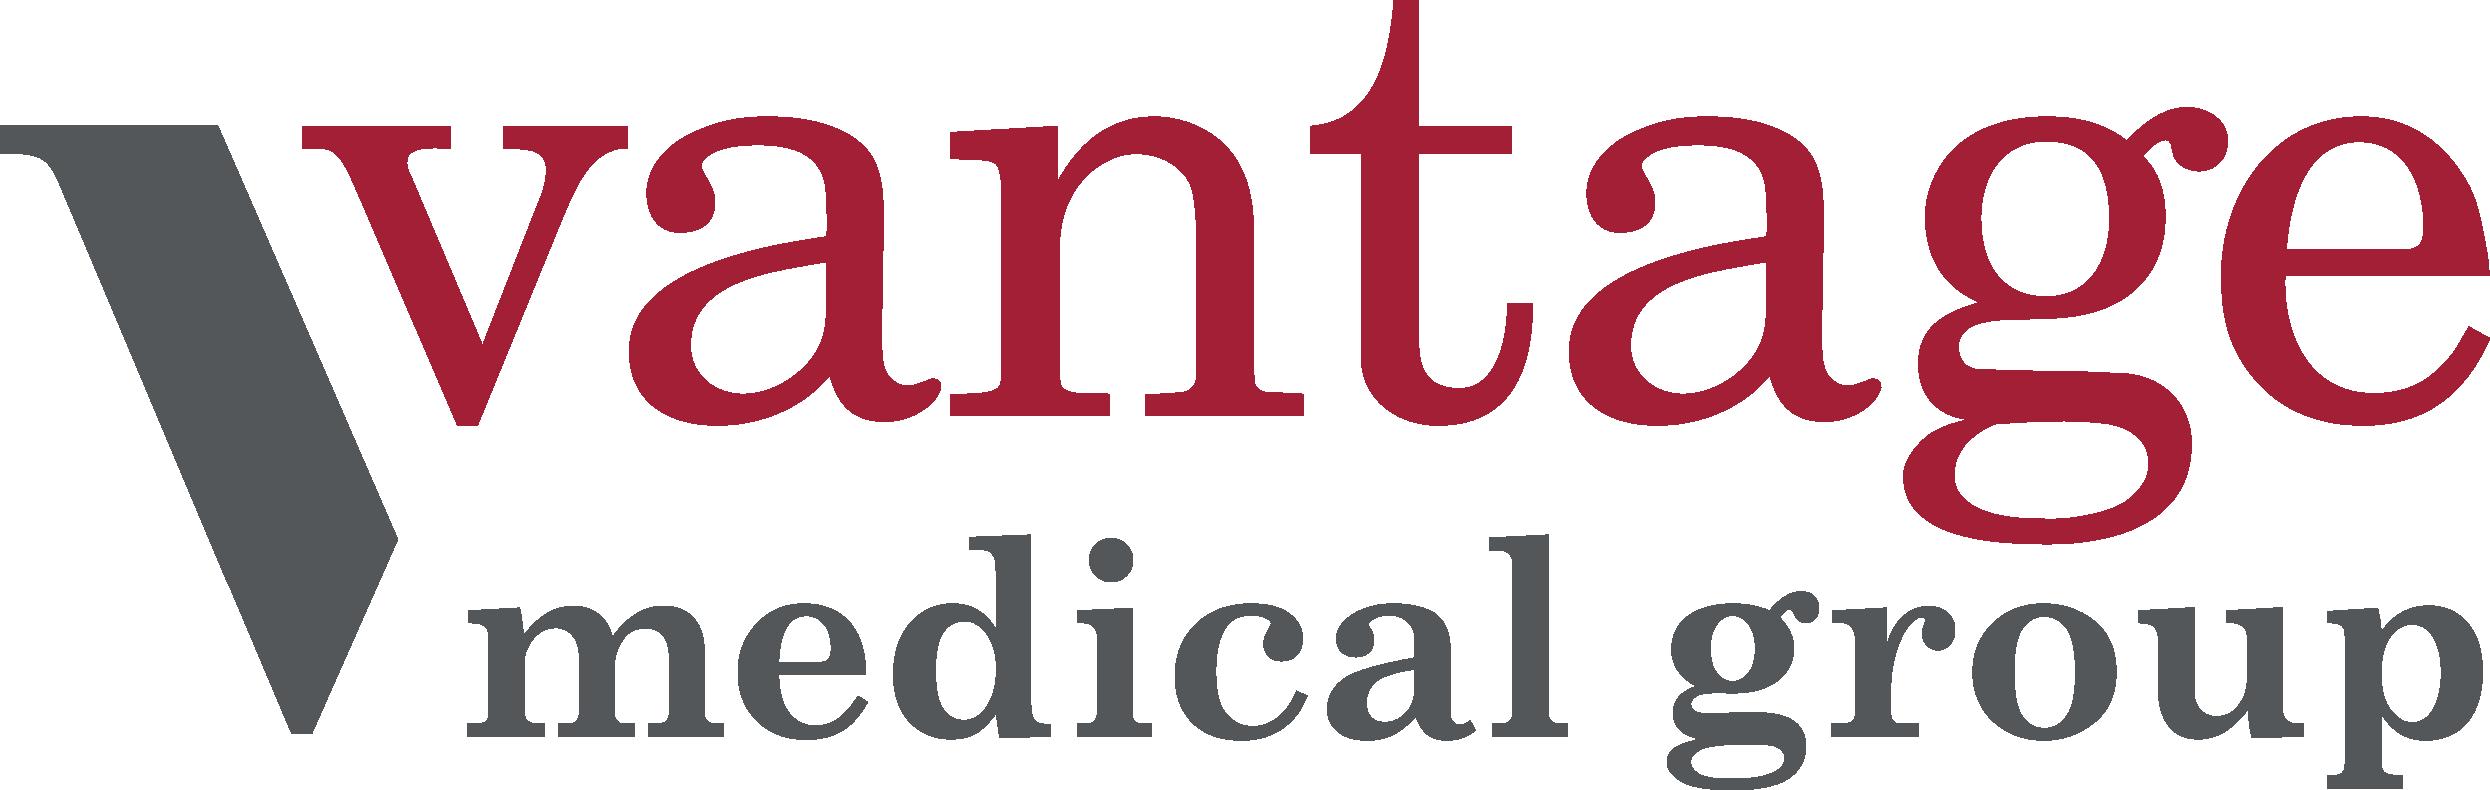 Vantage Medical Group